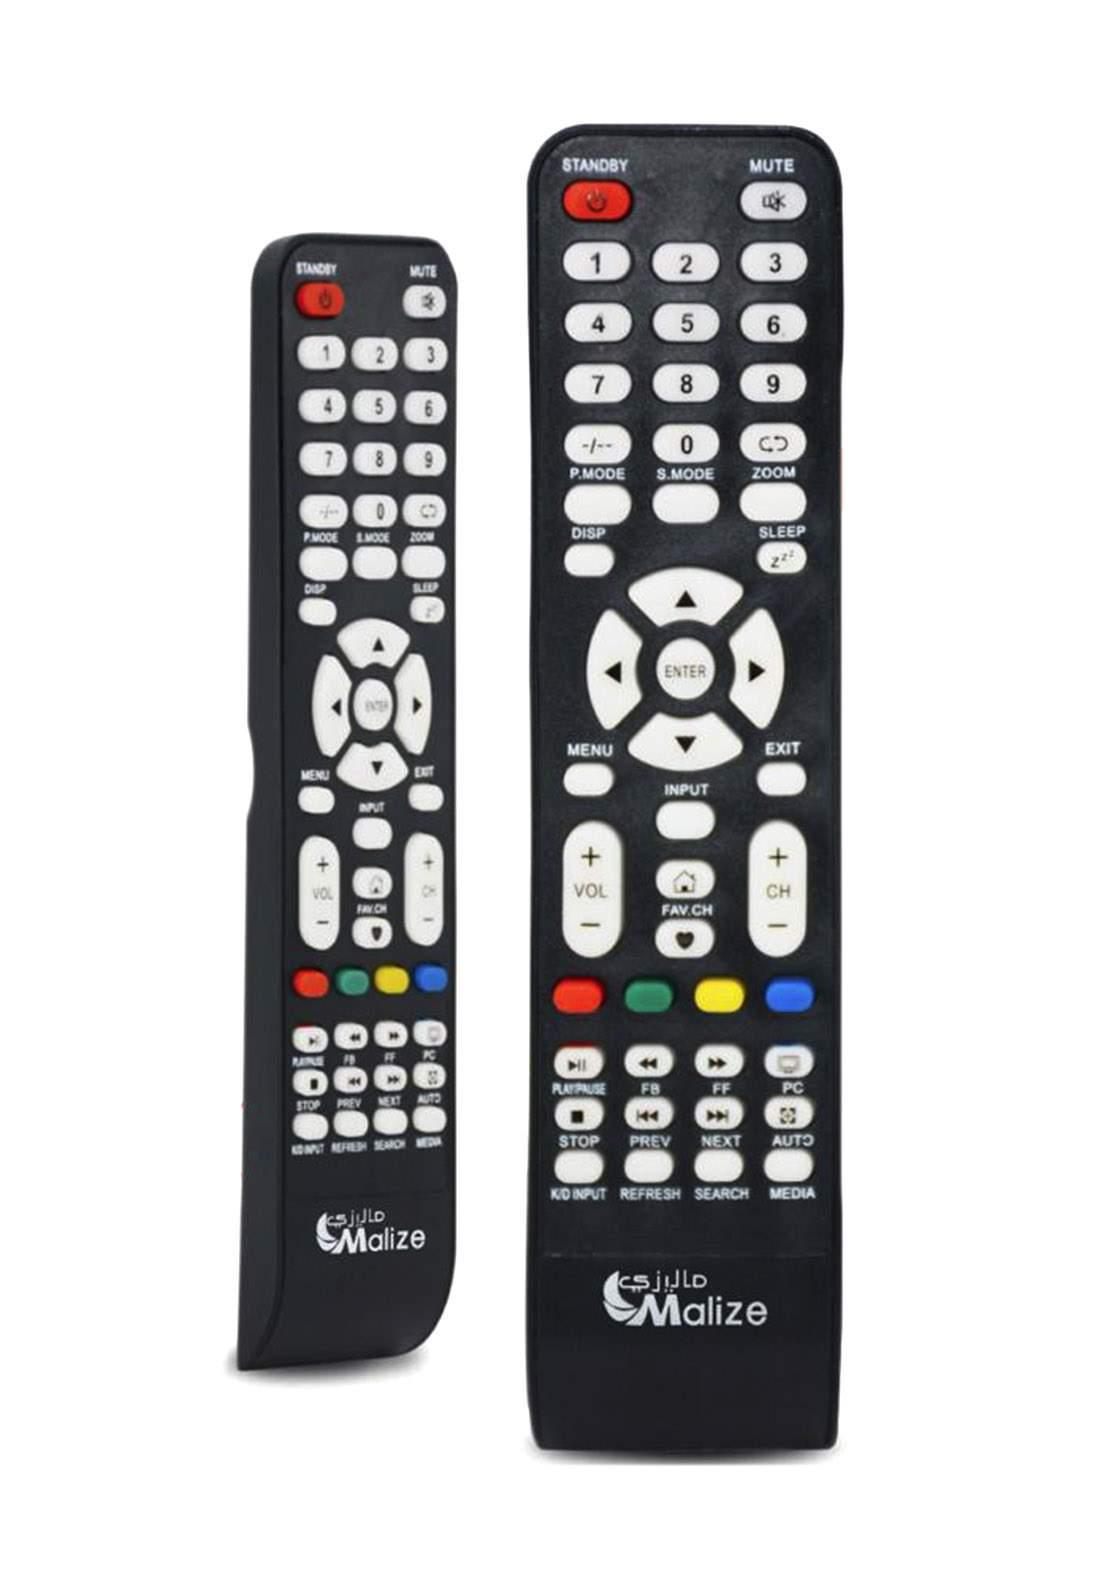 Remote Control For Malize Plasma TV (A-740) جهاز تحكم عن بعد